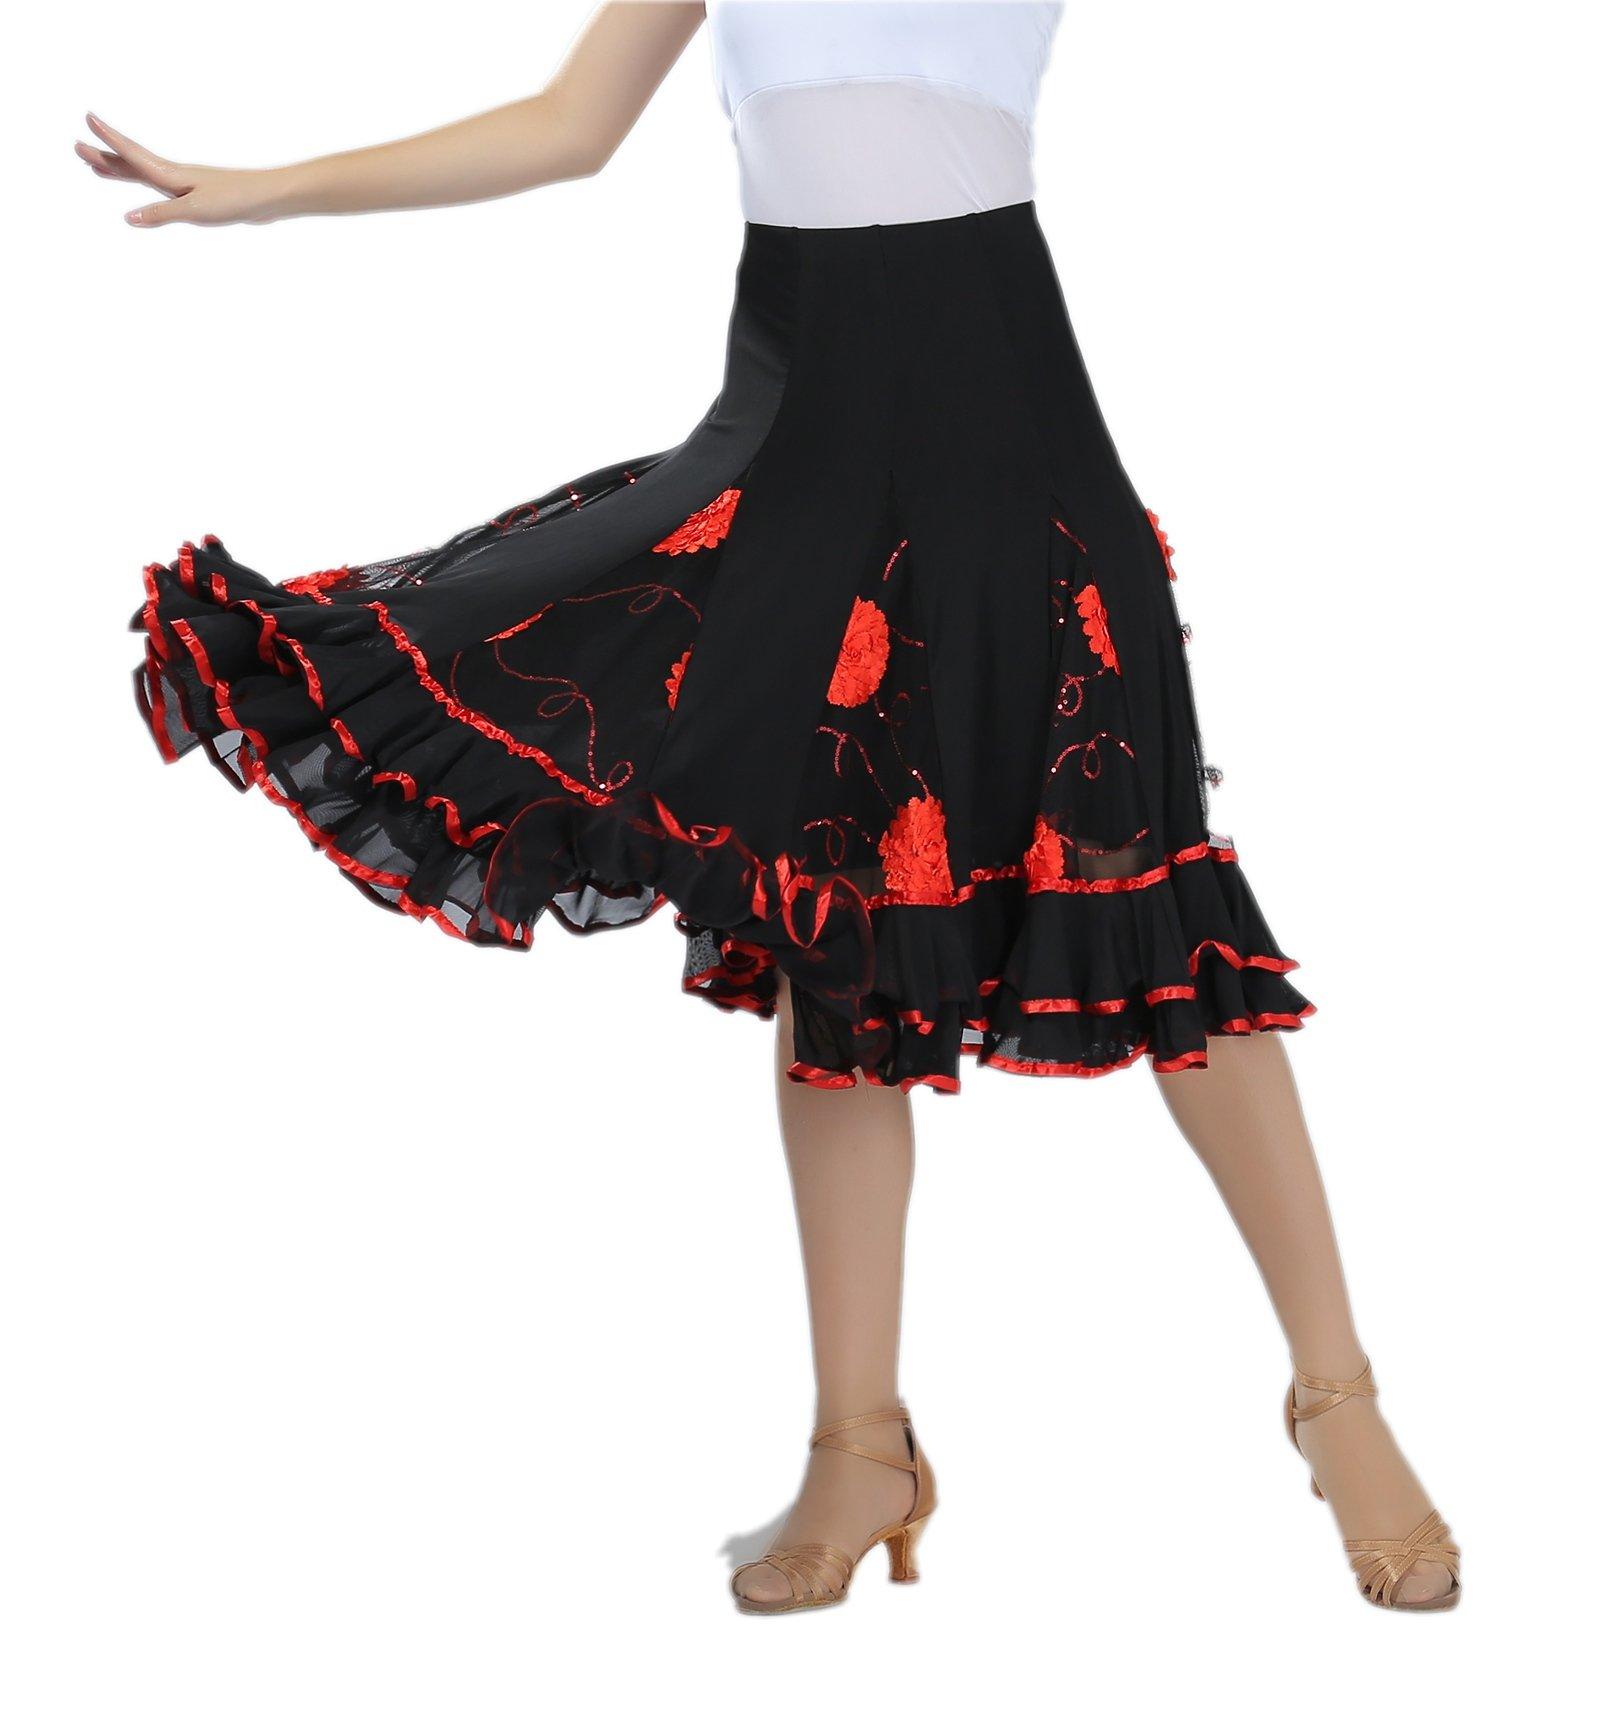 CISMARK Women's Elegant Ballroom Dancing Latin Dance Salsa Tango Swing Skirt red One Size by CISMARK